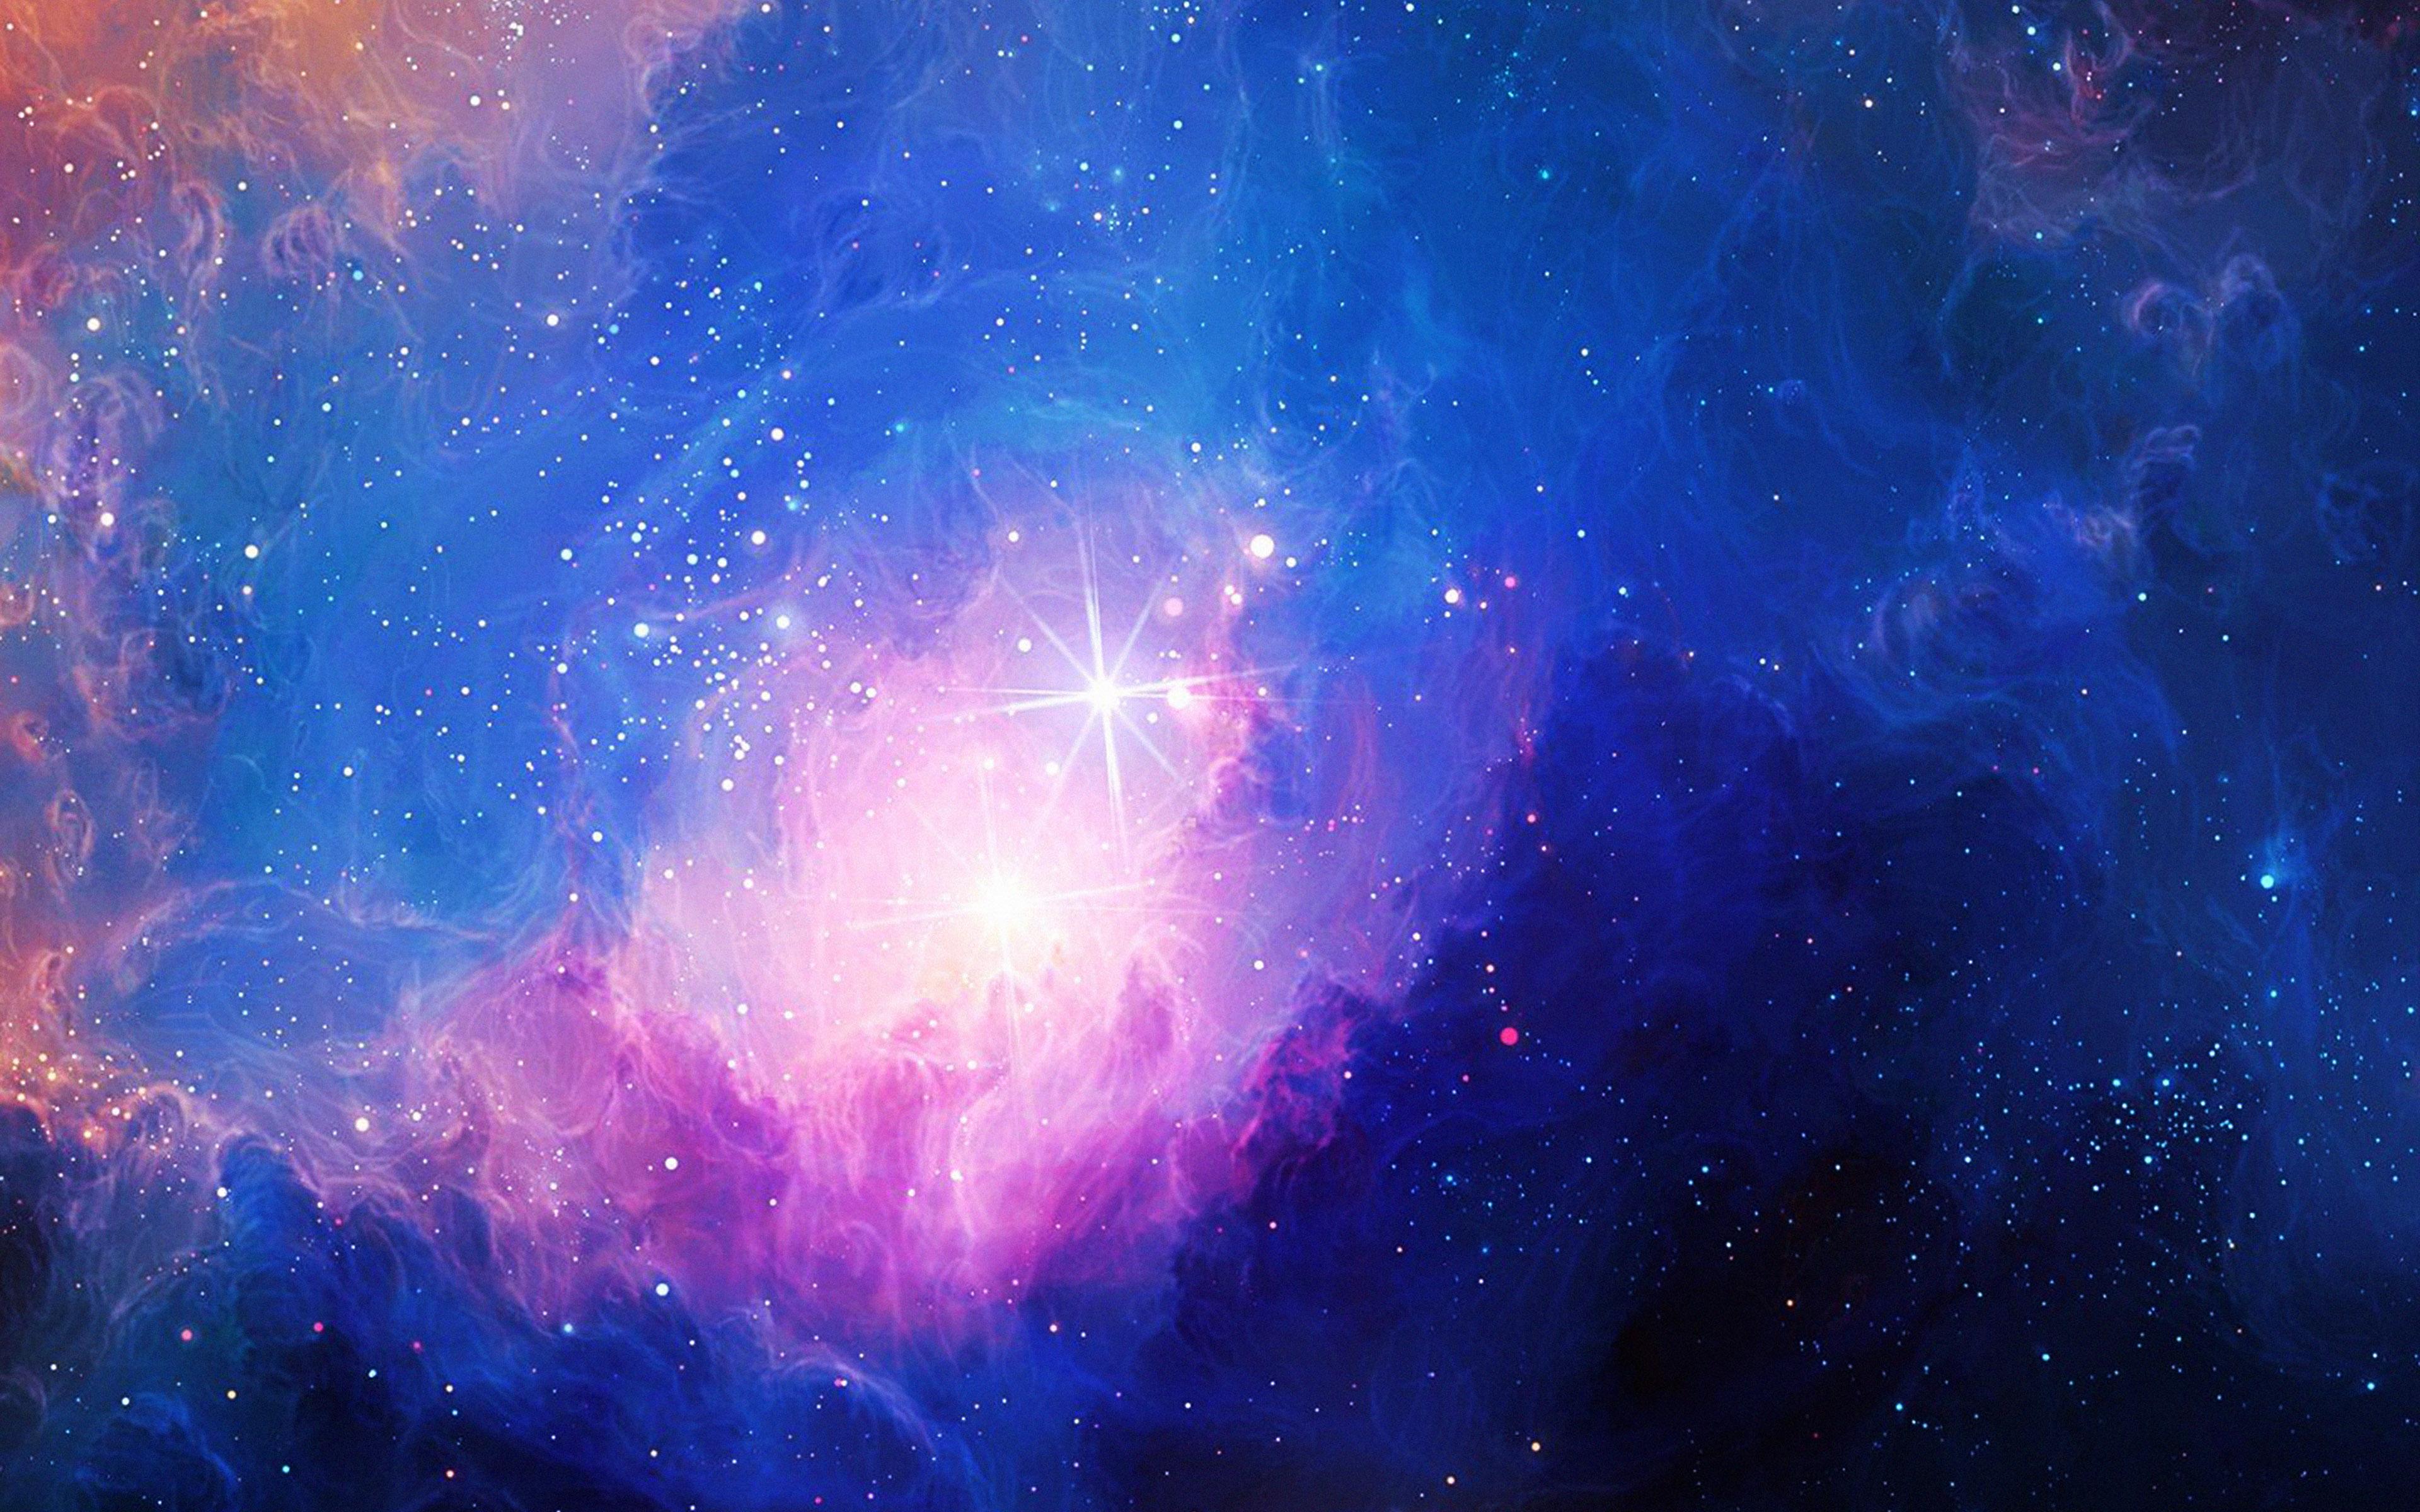 Phone Fall Wallpaper Mn48 Space Aurora Art Star Illust Blue Rainbow Papers Co